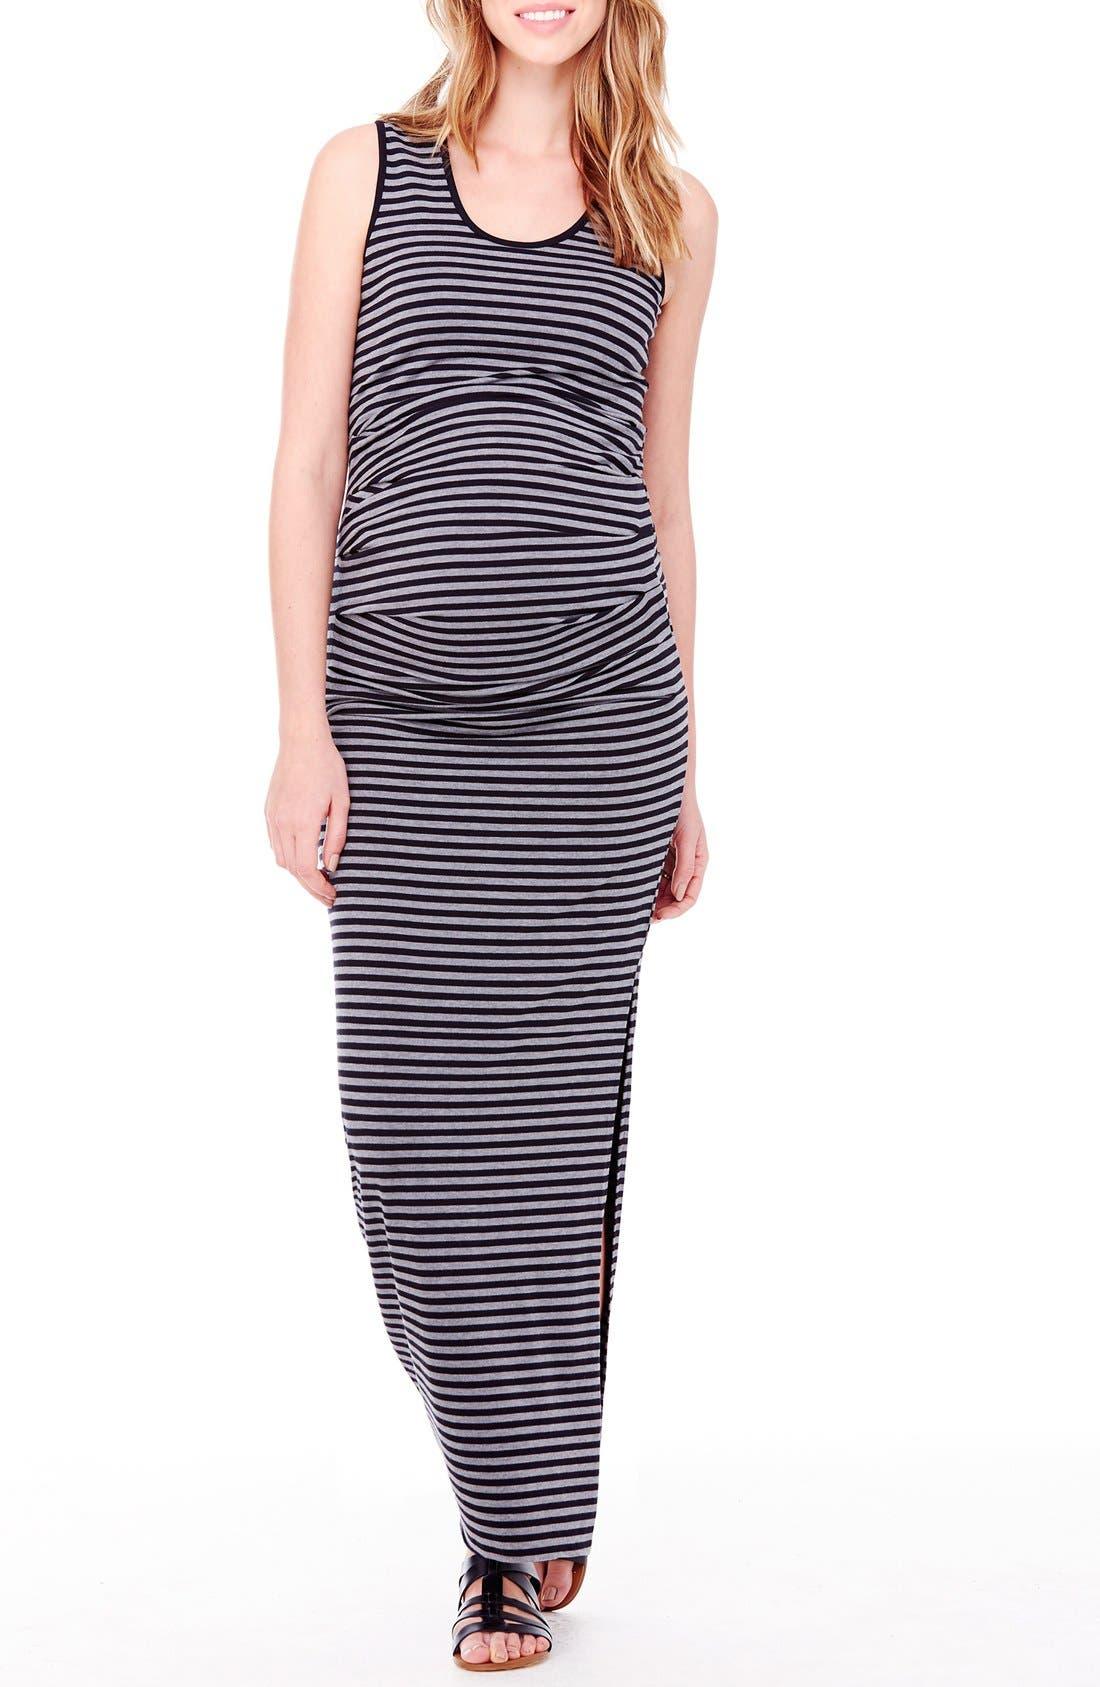 Striped Tank Maternity Maxi Dress,                             Main thumbnail 1, color,                             Black/ Heather Grey Stripe